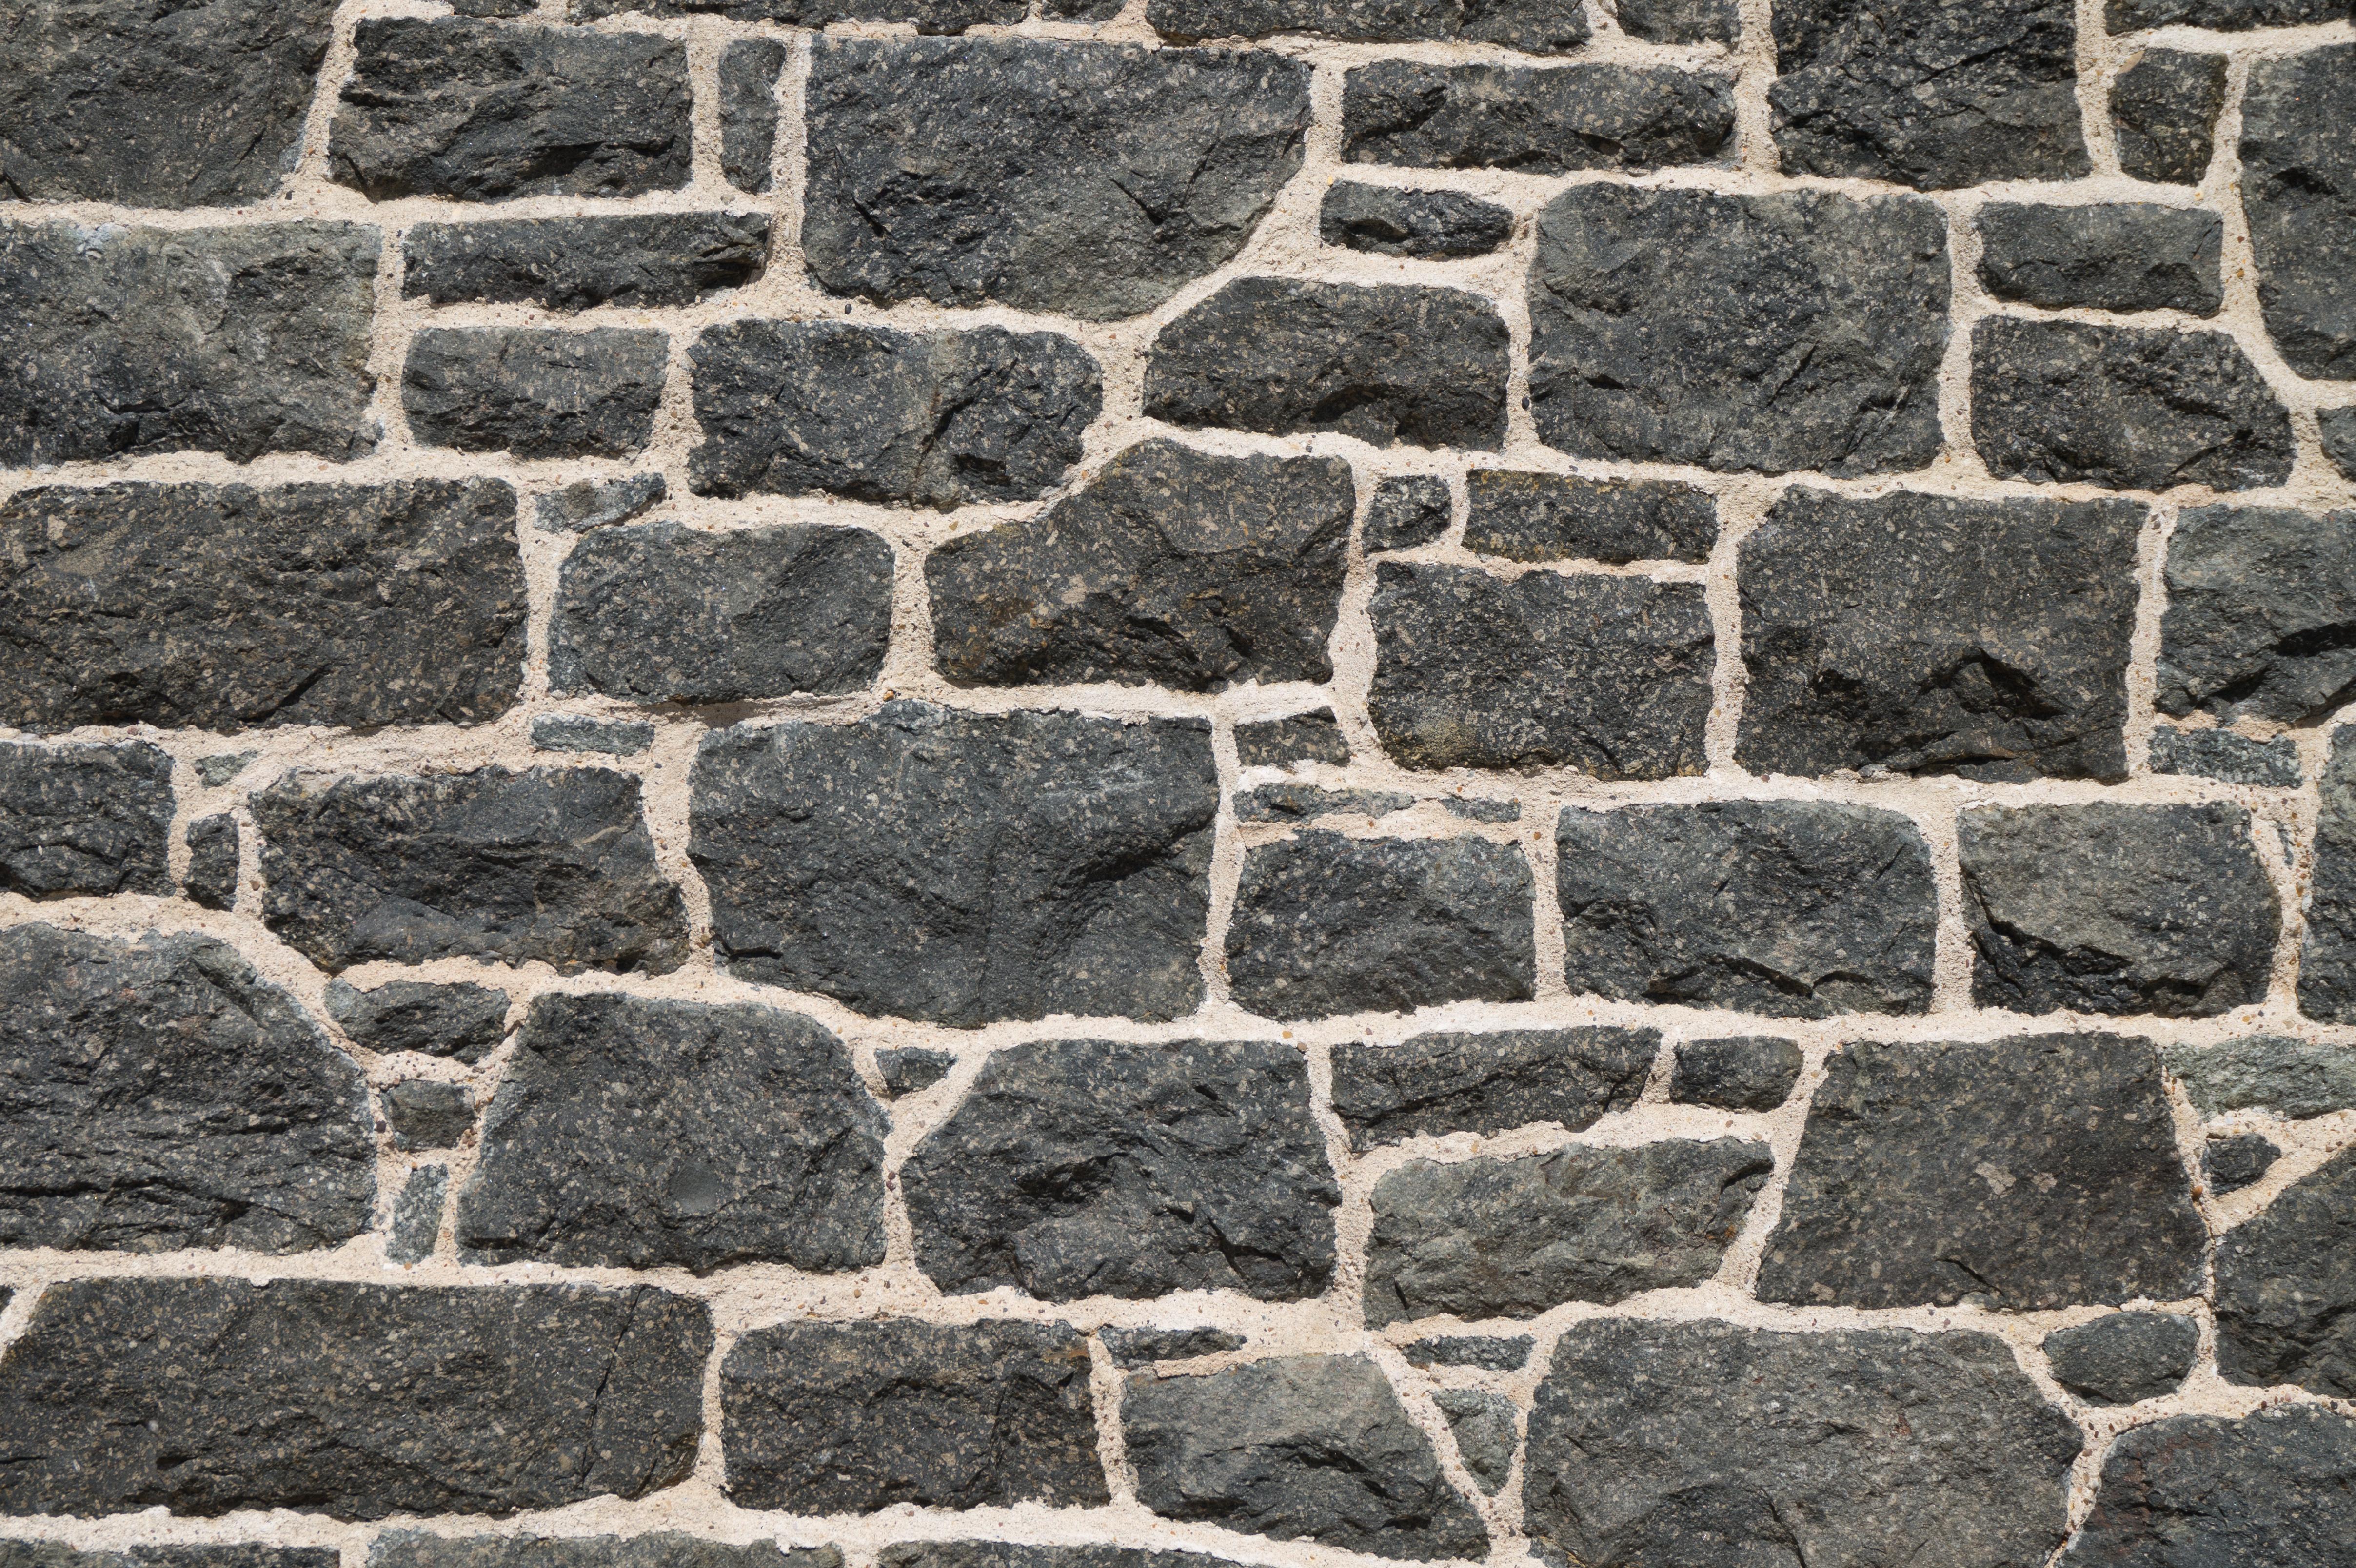 Stone Wall-022 - Stone - Texturify - Free textures